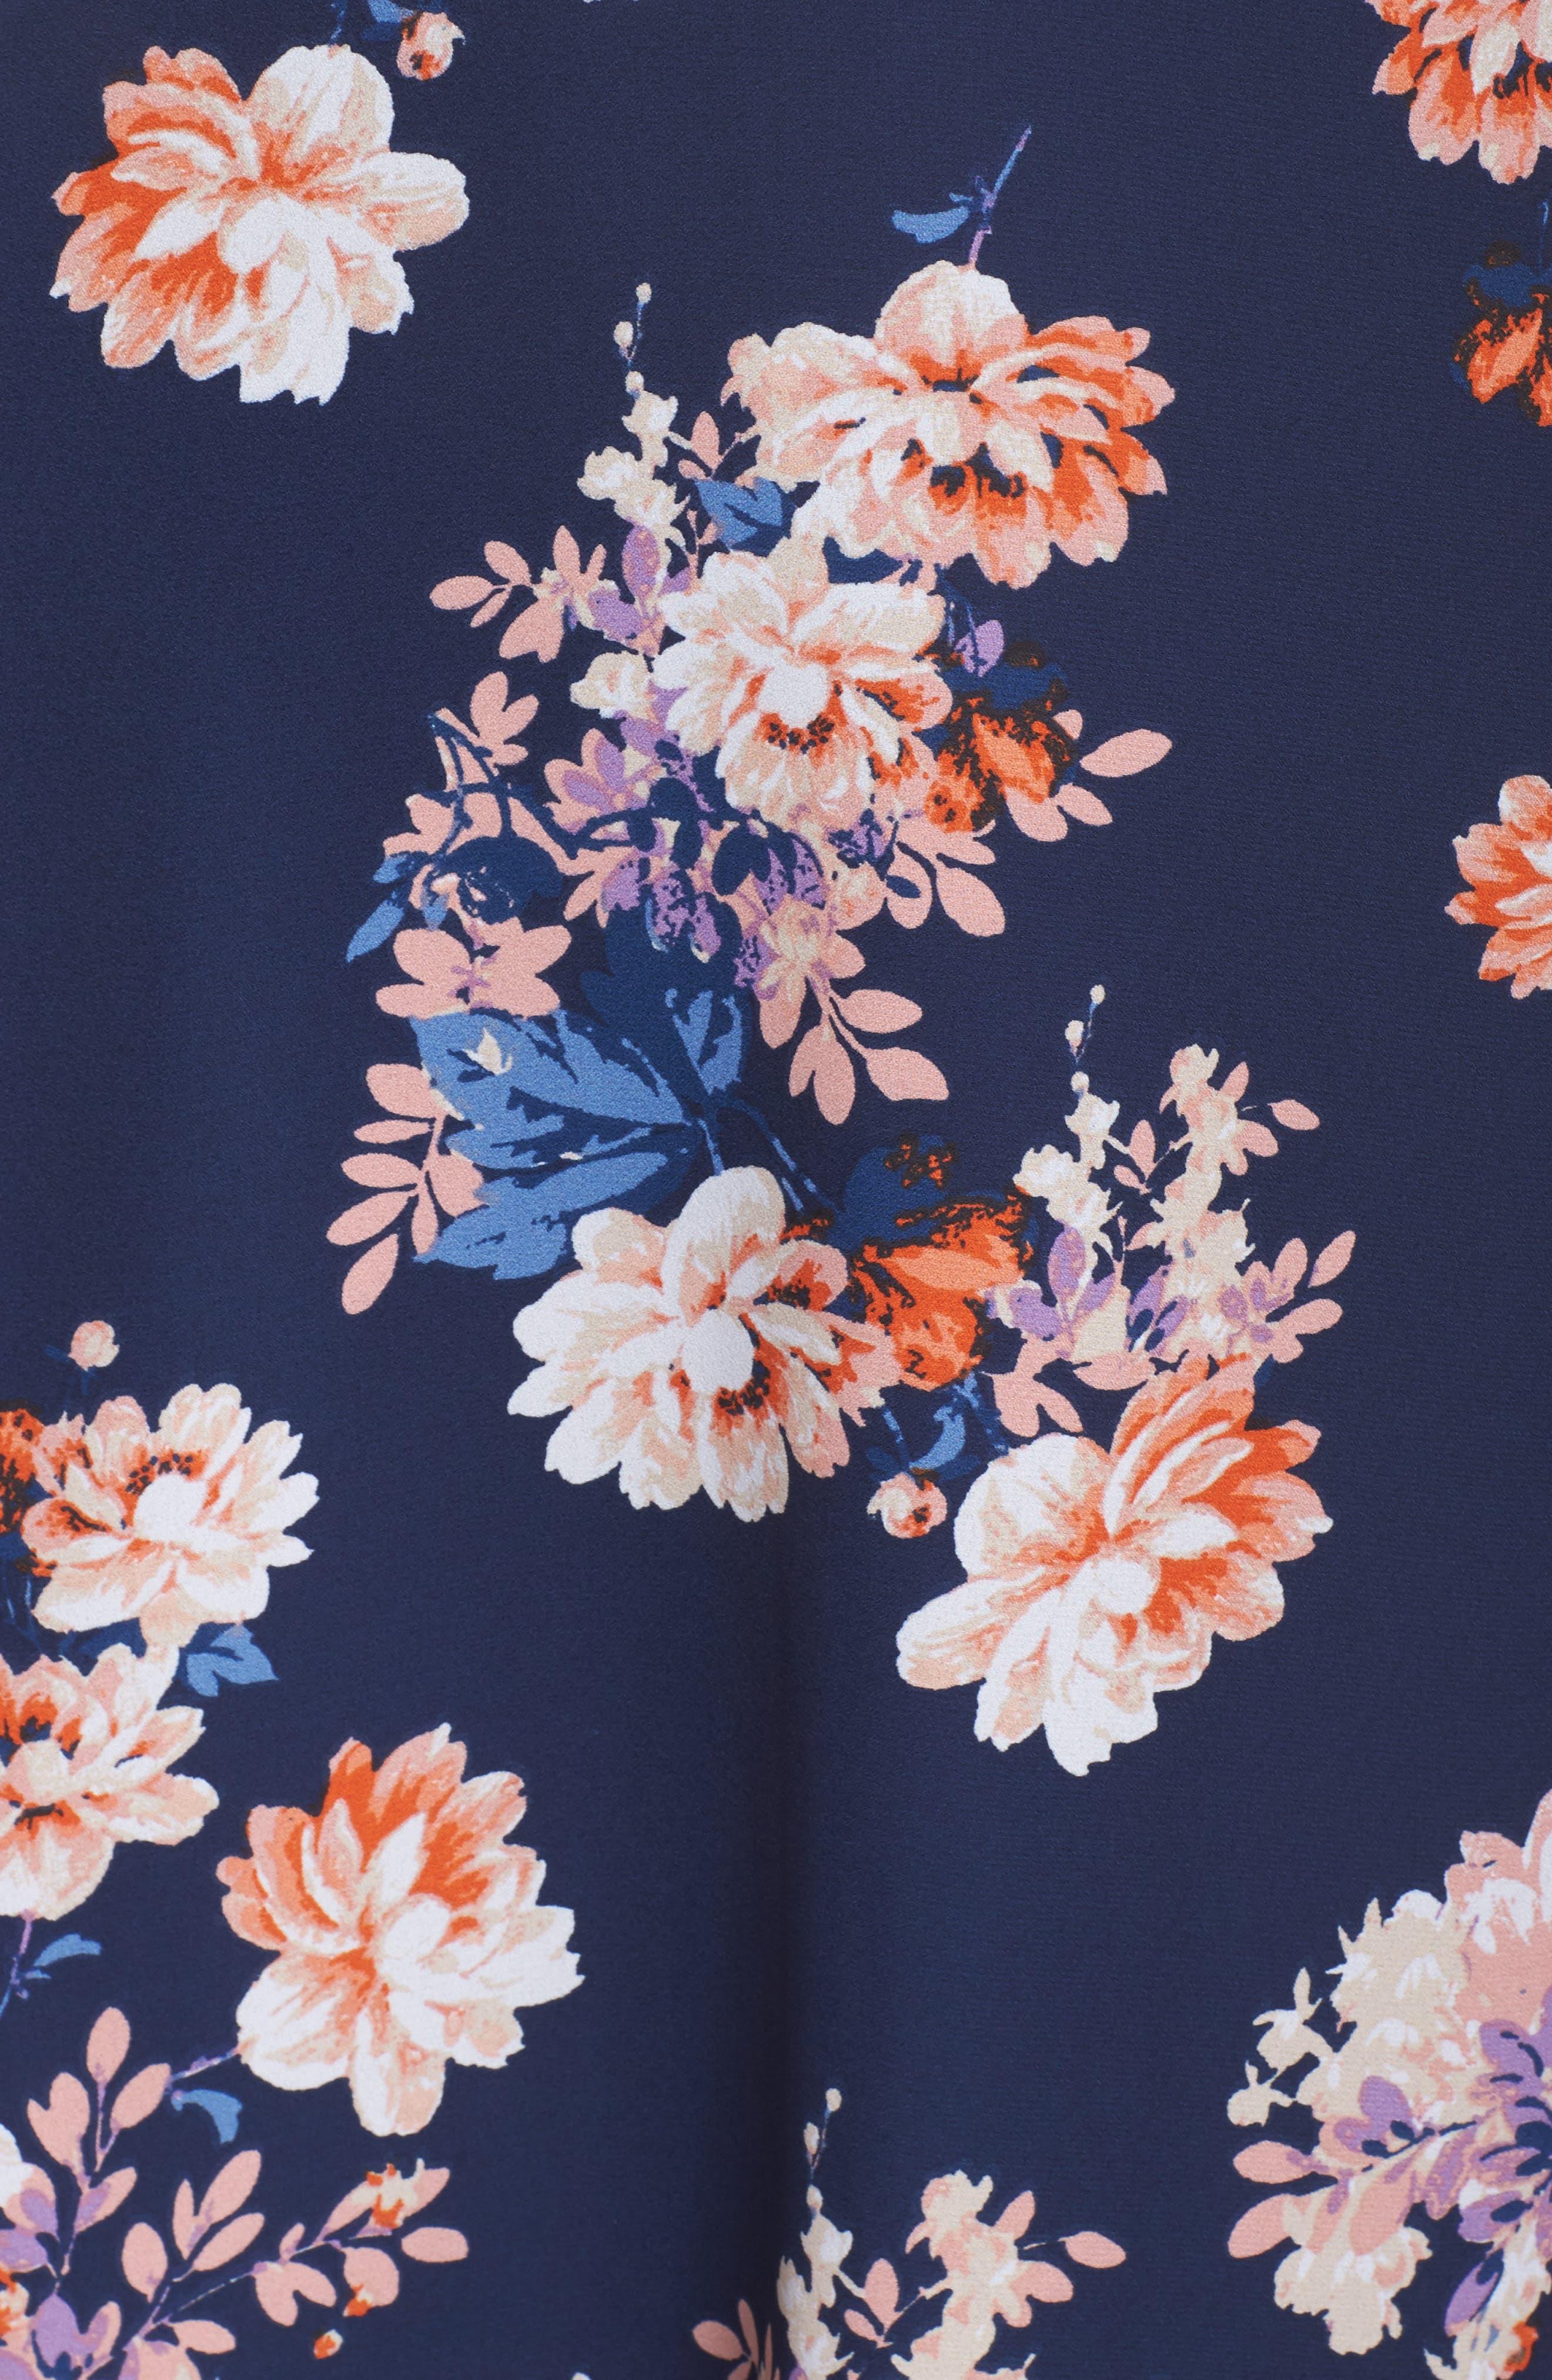 Chasing Butterflies Maxi Dress,                             Alternate thumbnail 5, color,